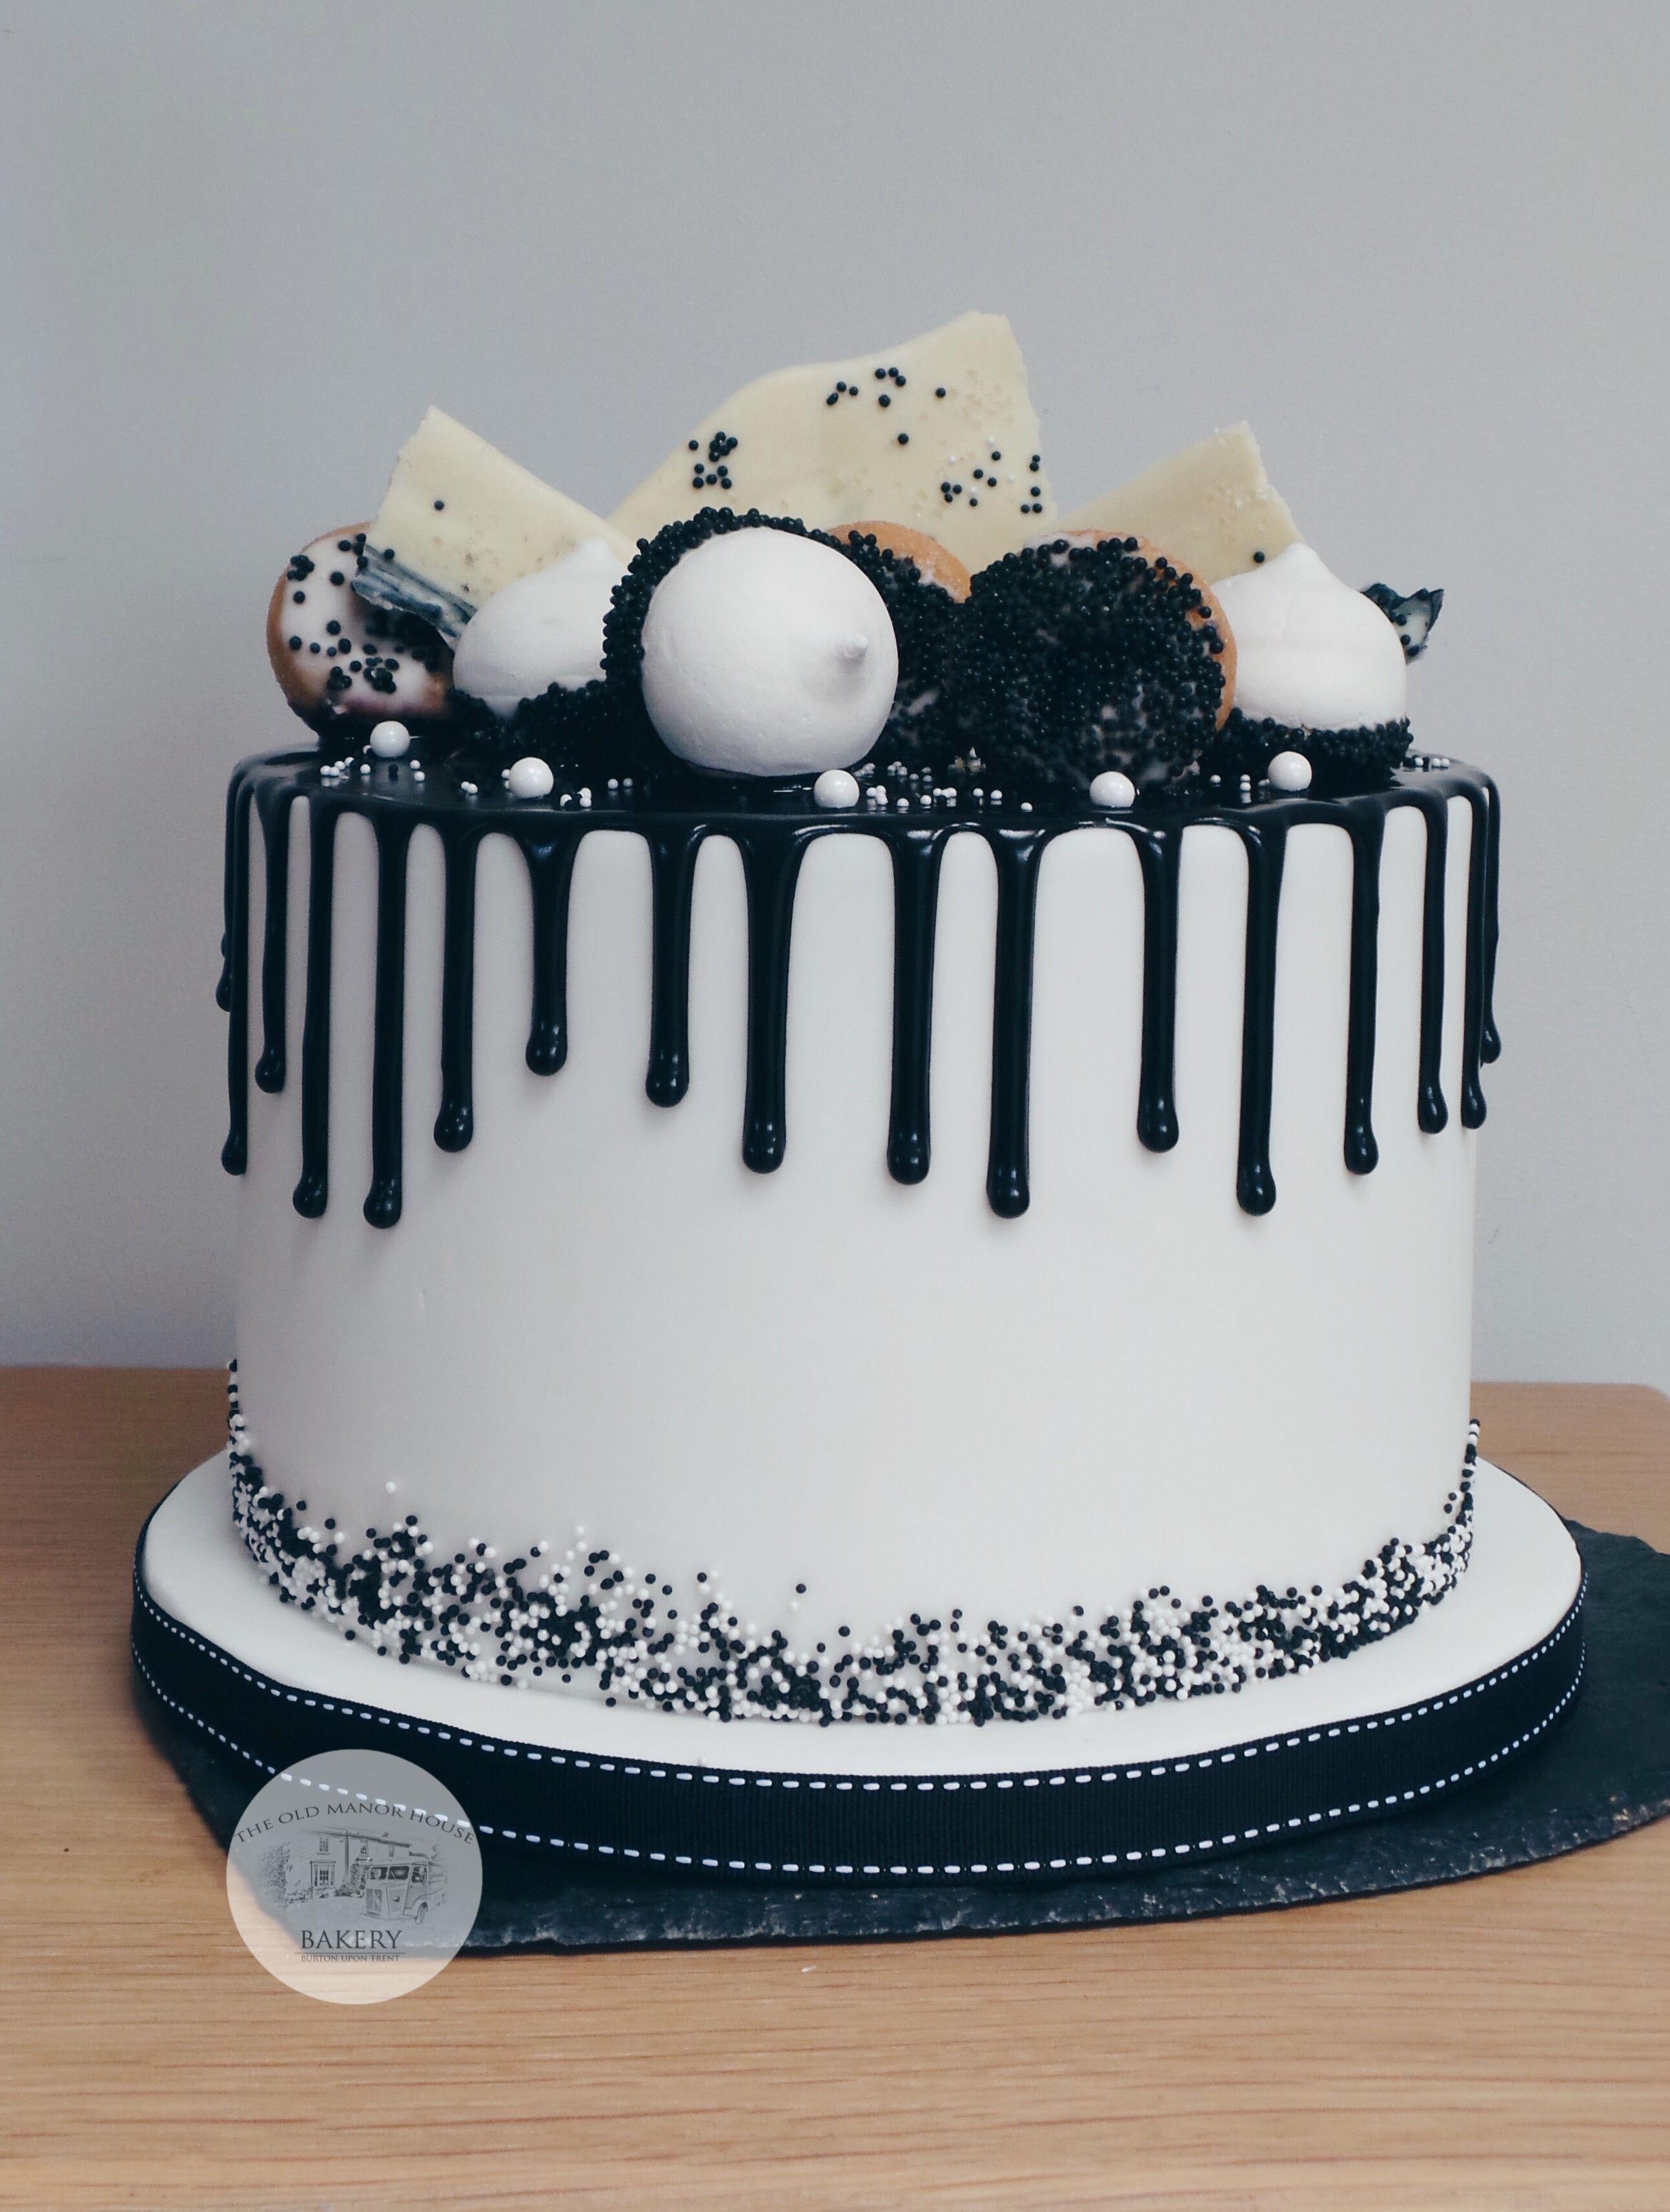 Black And White Drip Cake Loaded Drip Cakes Birthday Cake For Him Funny Birthday Cakes Surprise Birthday Cake